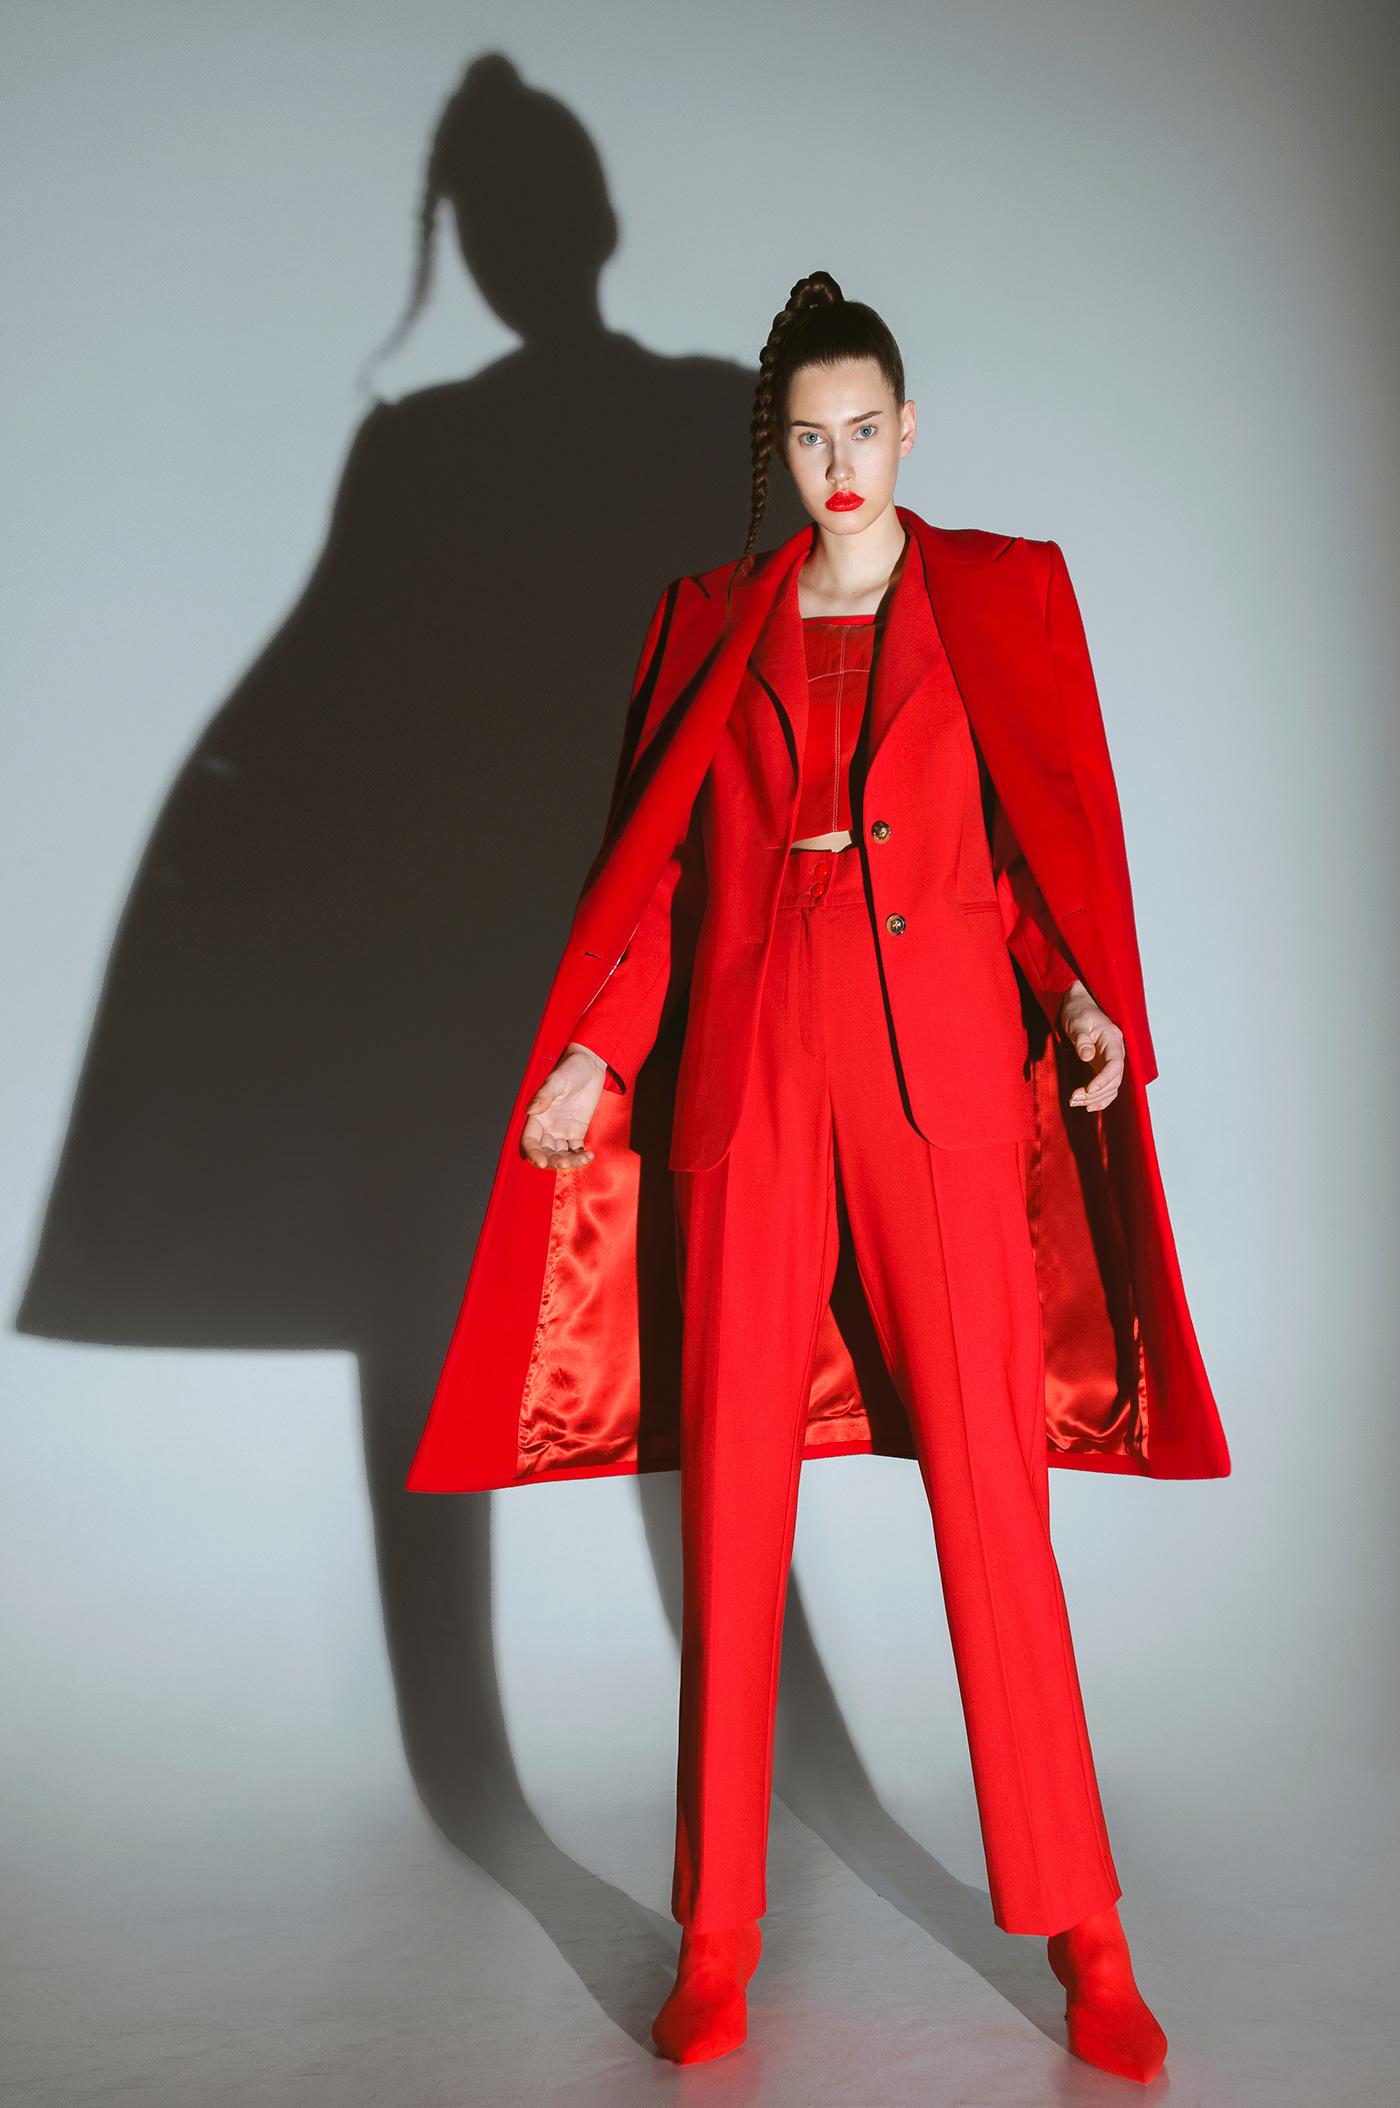 Image may contain: clothing, wall and coat